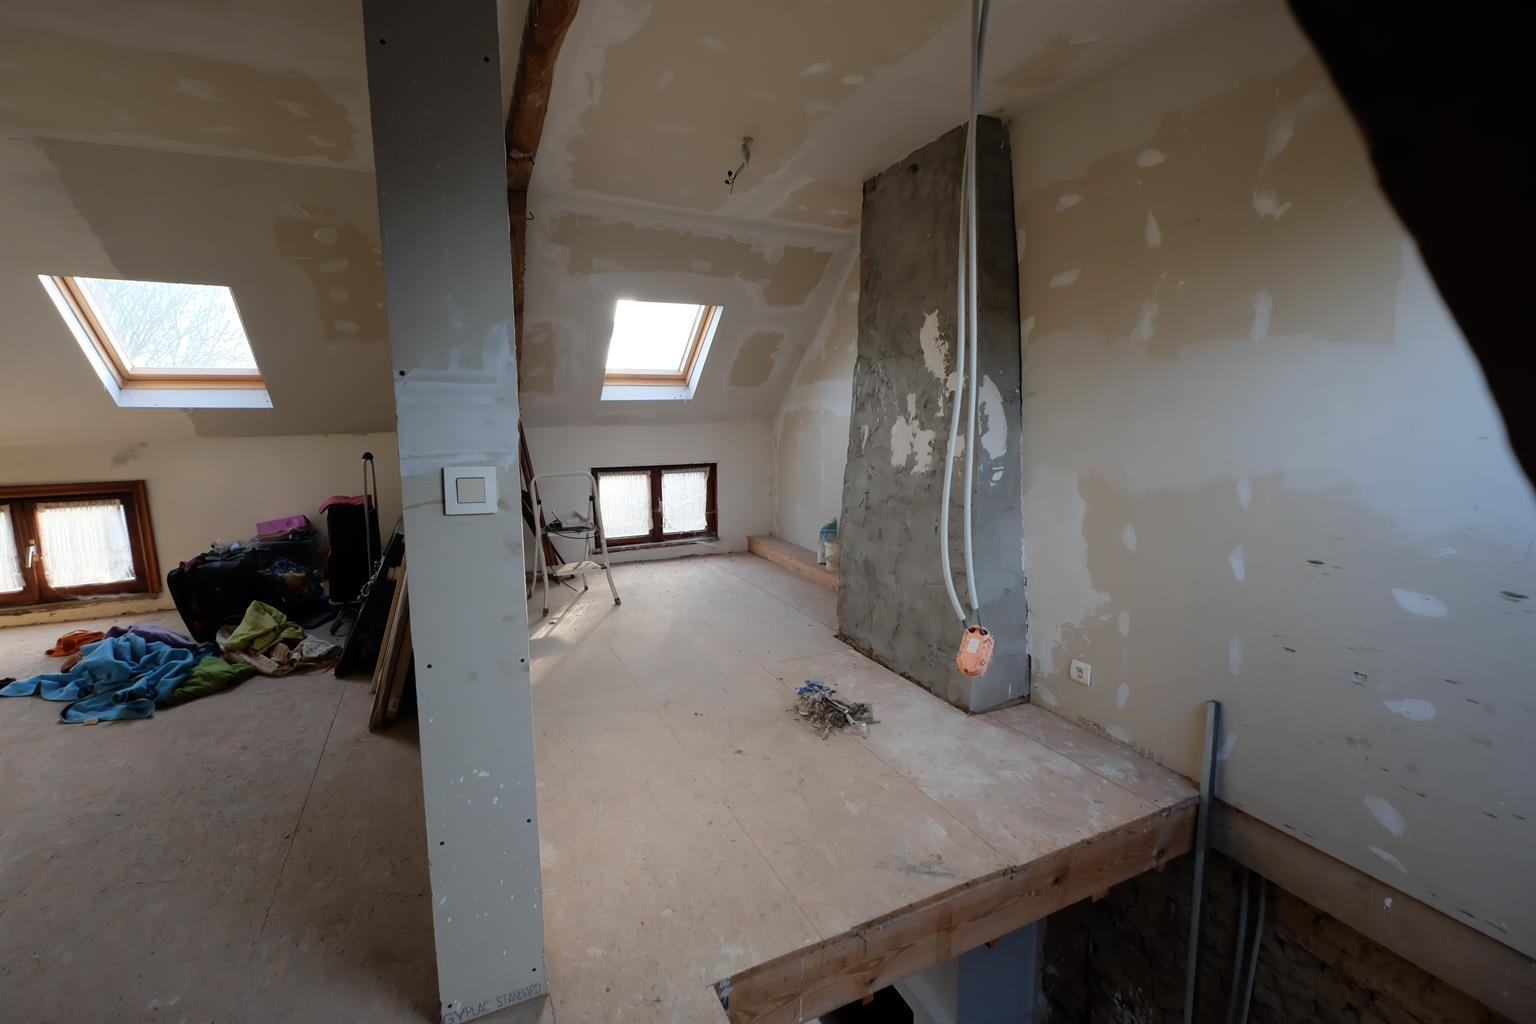 Maison - Tubize Oisquercq - #4500506-5